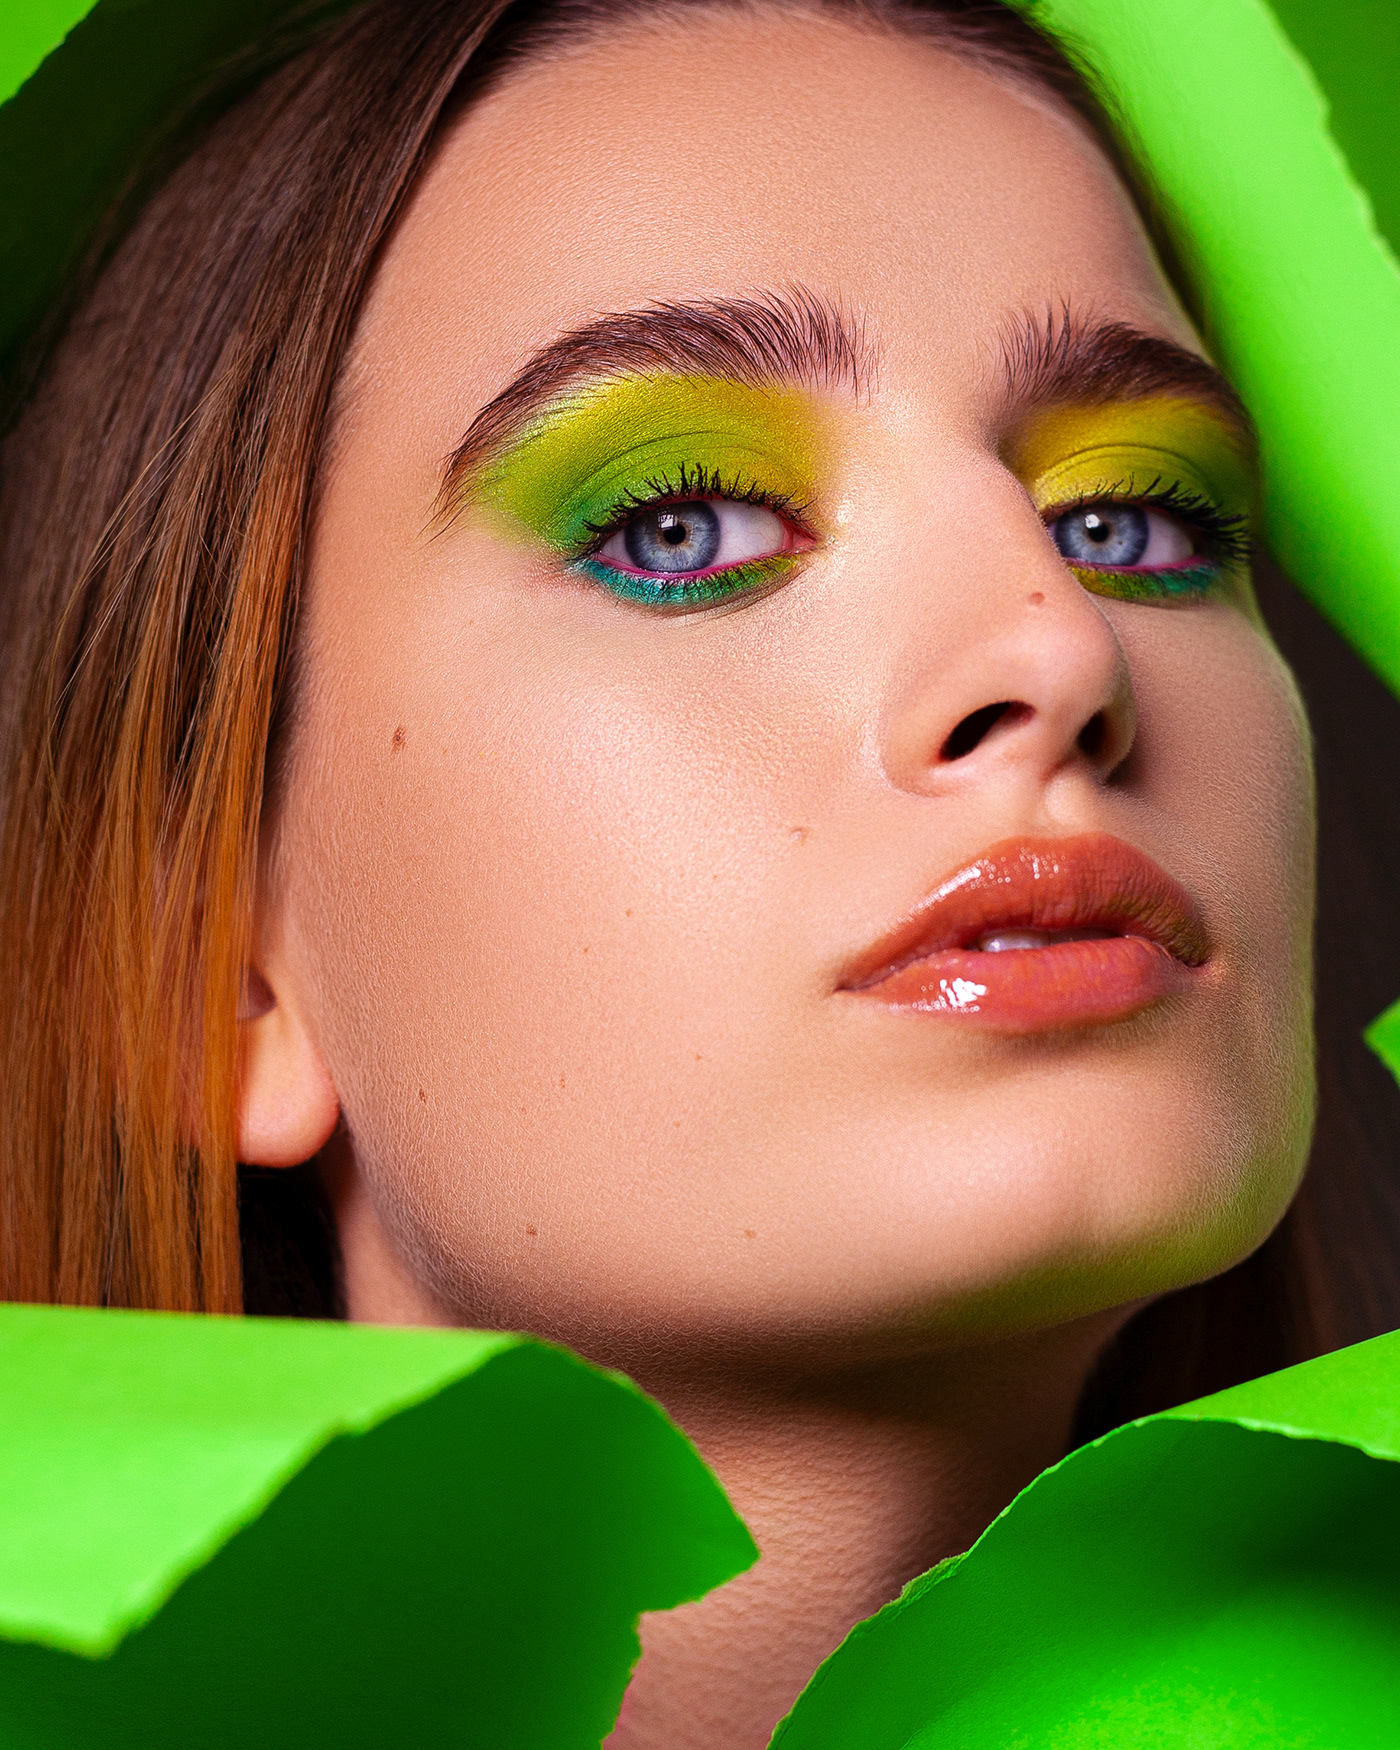 beauty Beautyretouching closeup makeup portrait retouch retouching